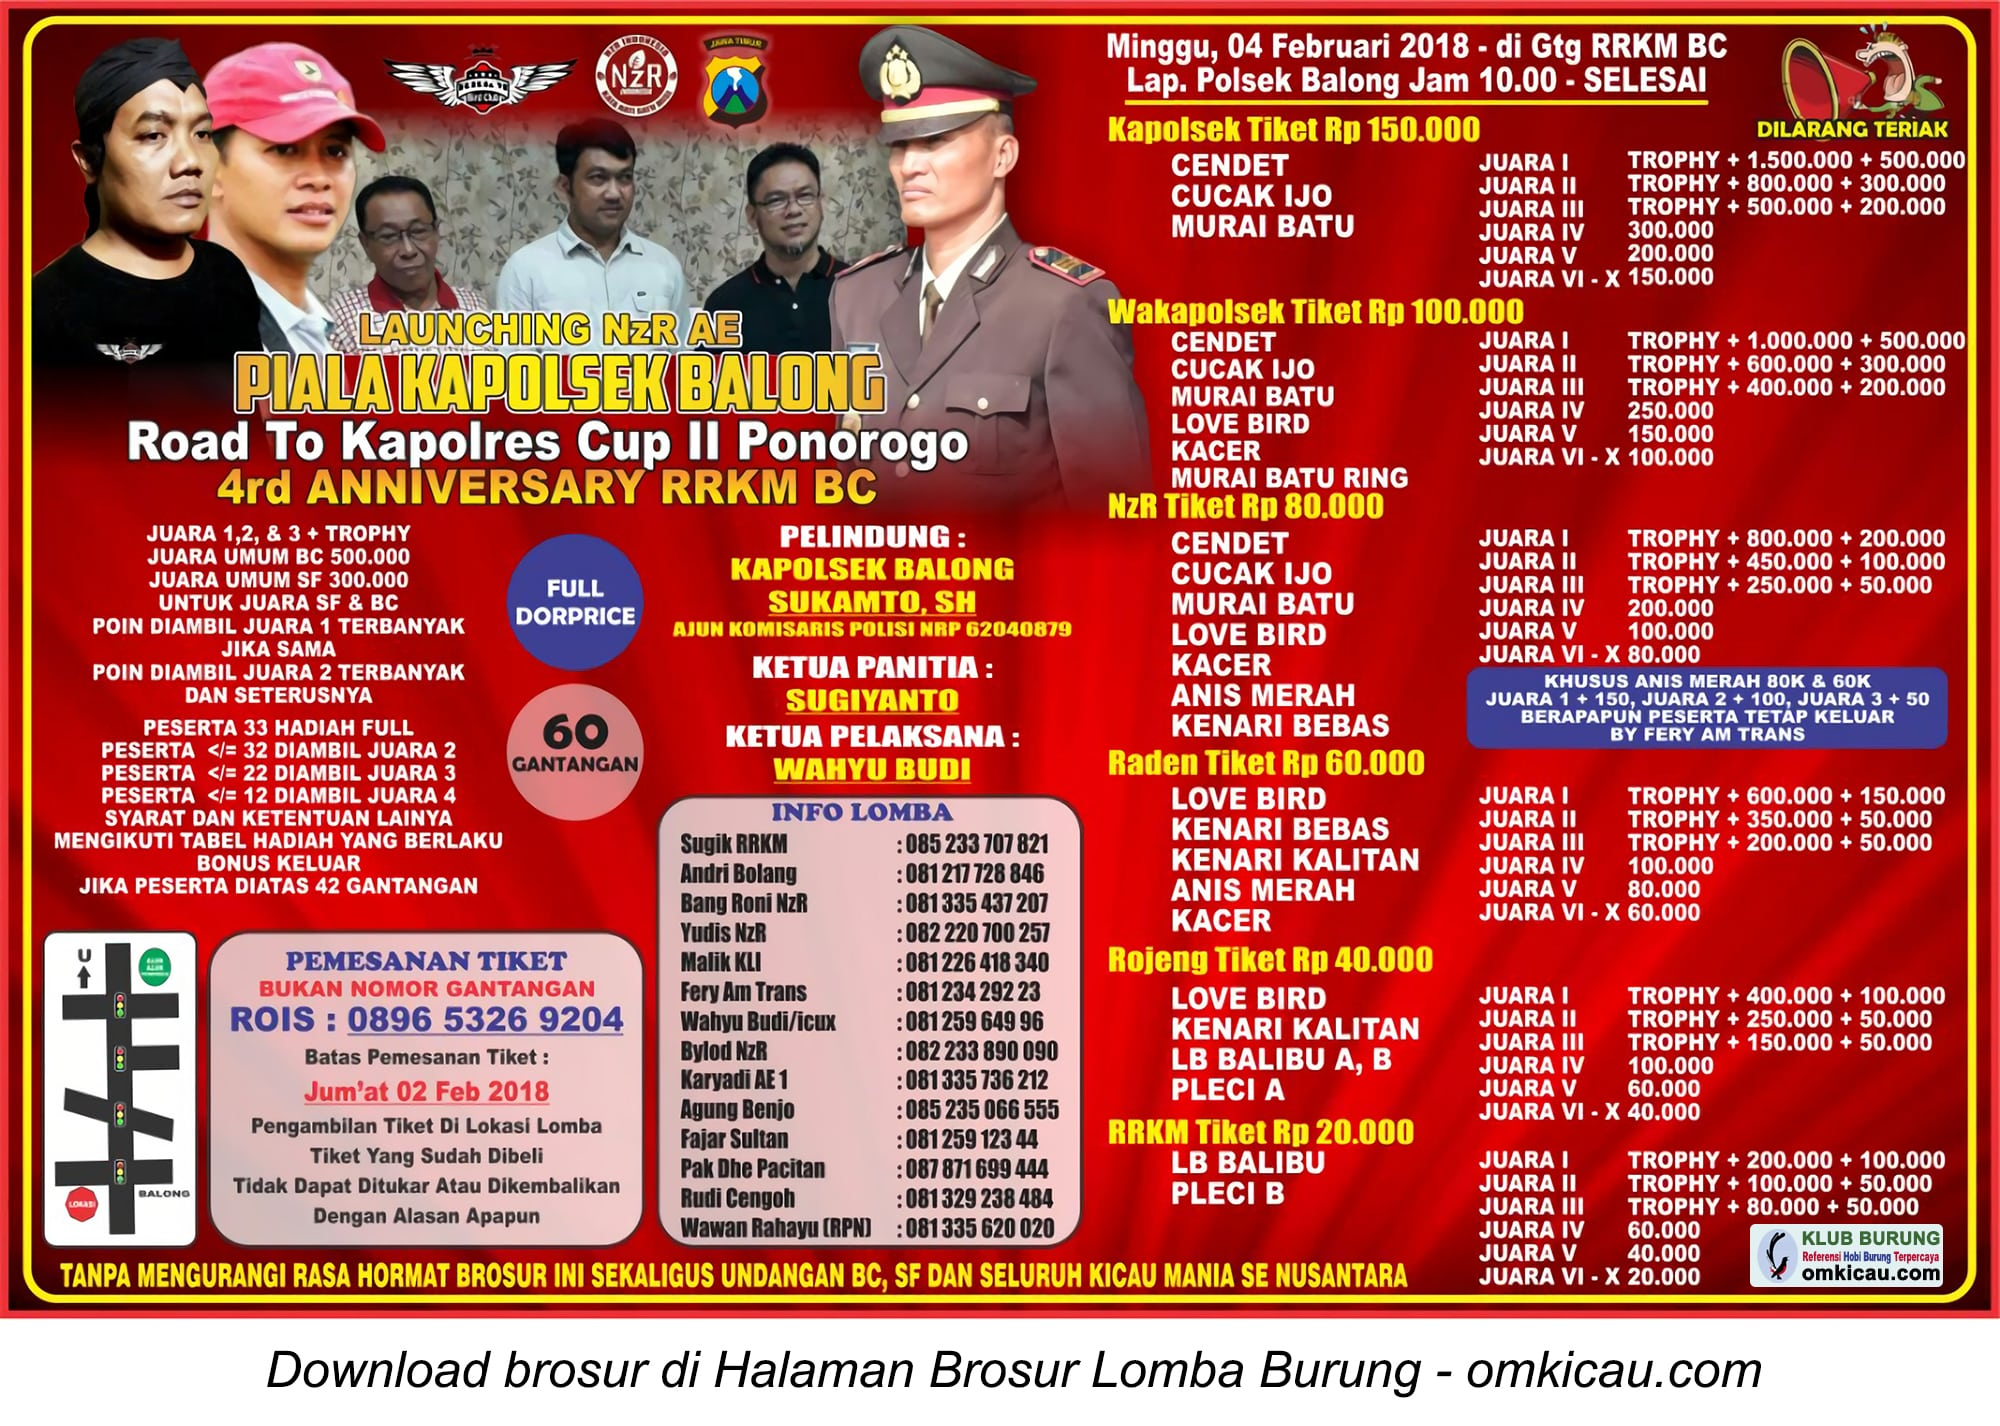 Piala Kapolsek Balong